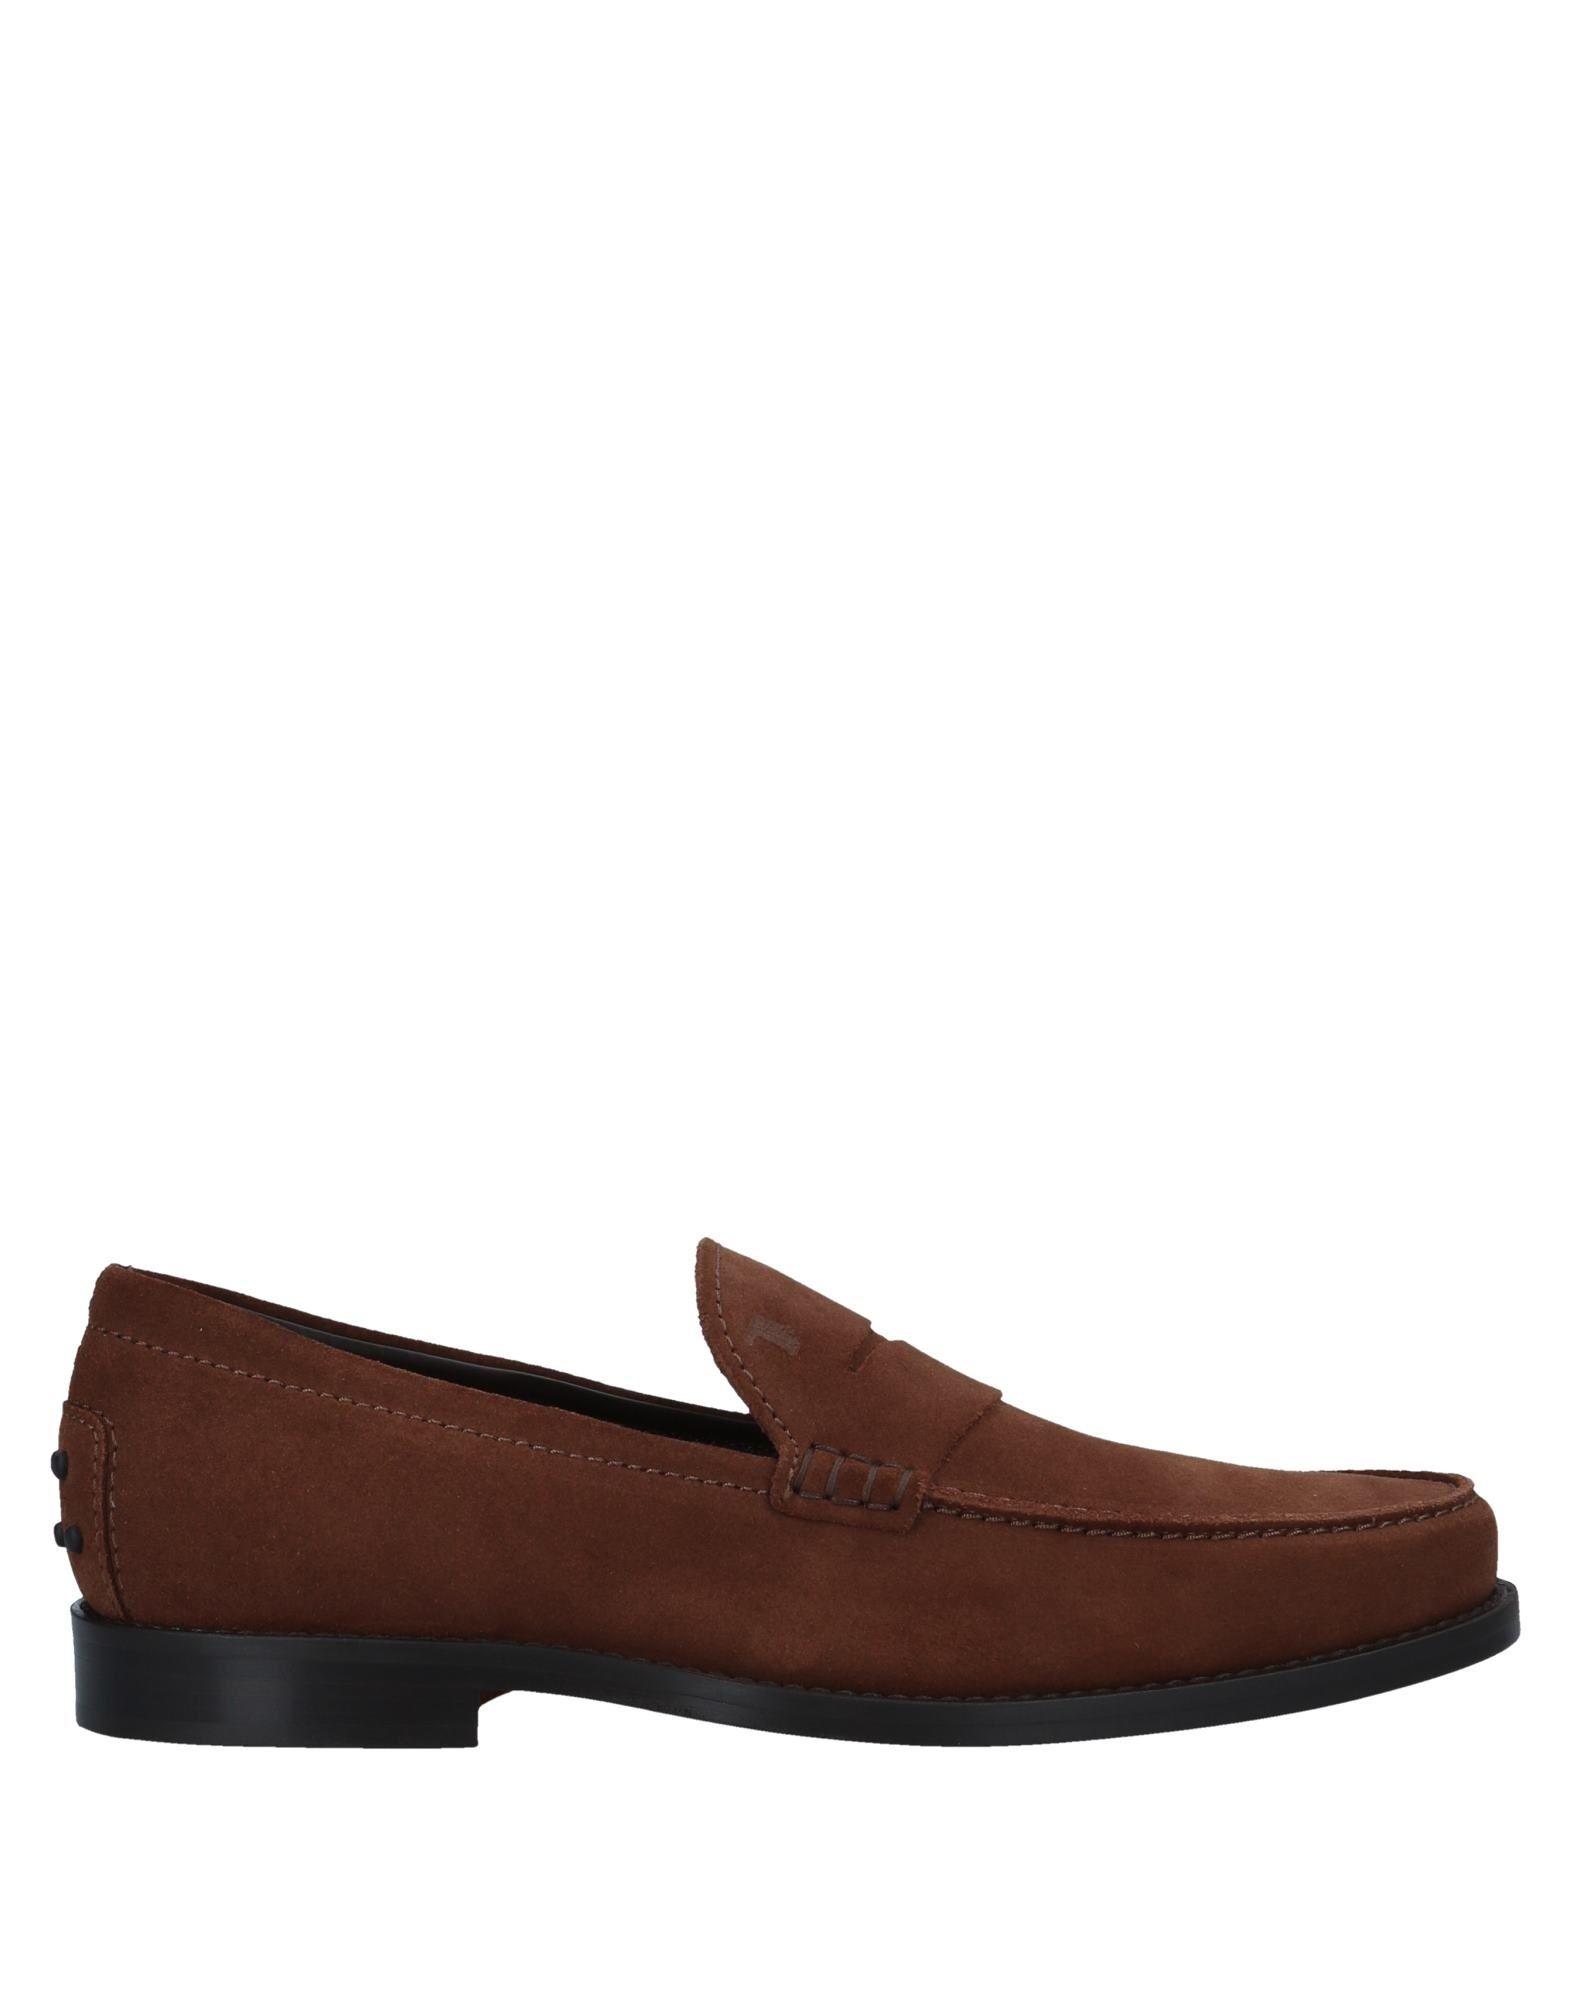 Tod's Mokassins Herren  11549207OJ Gute Qualität beliebte Schuhe